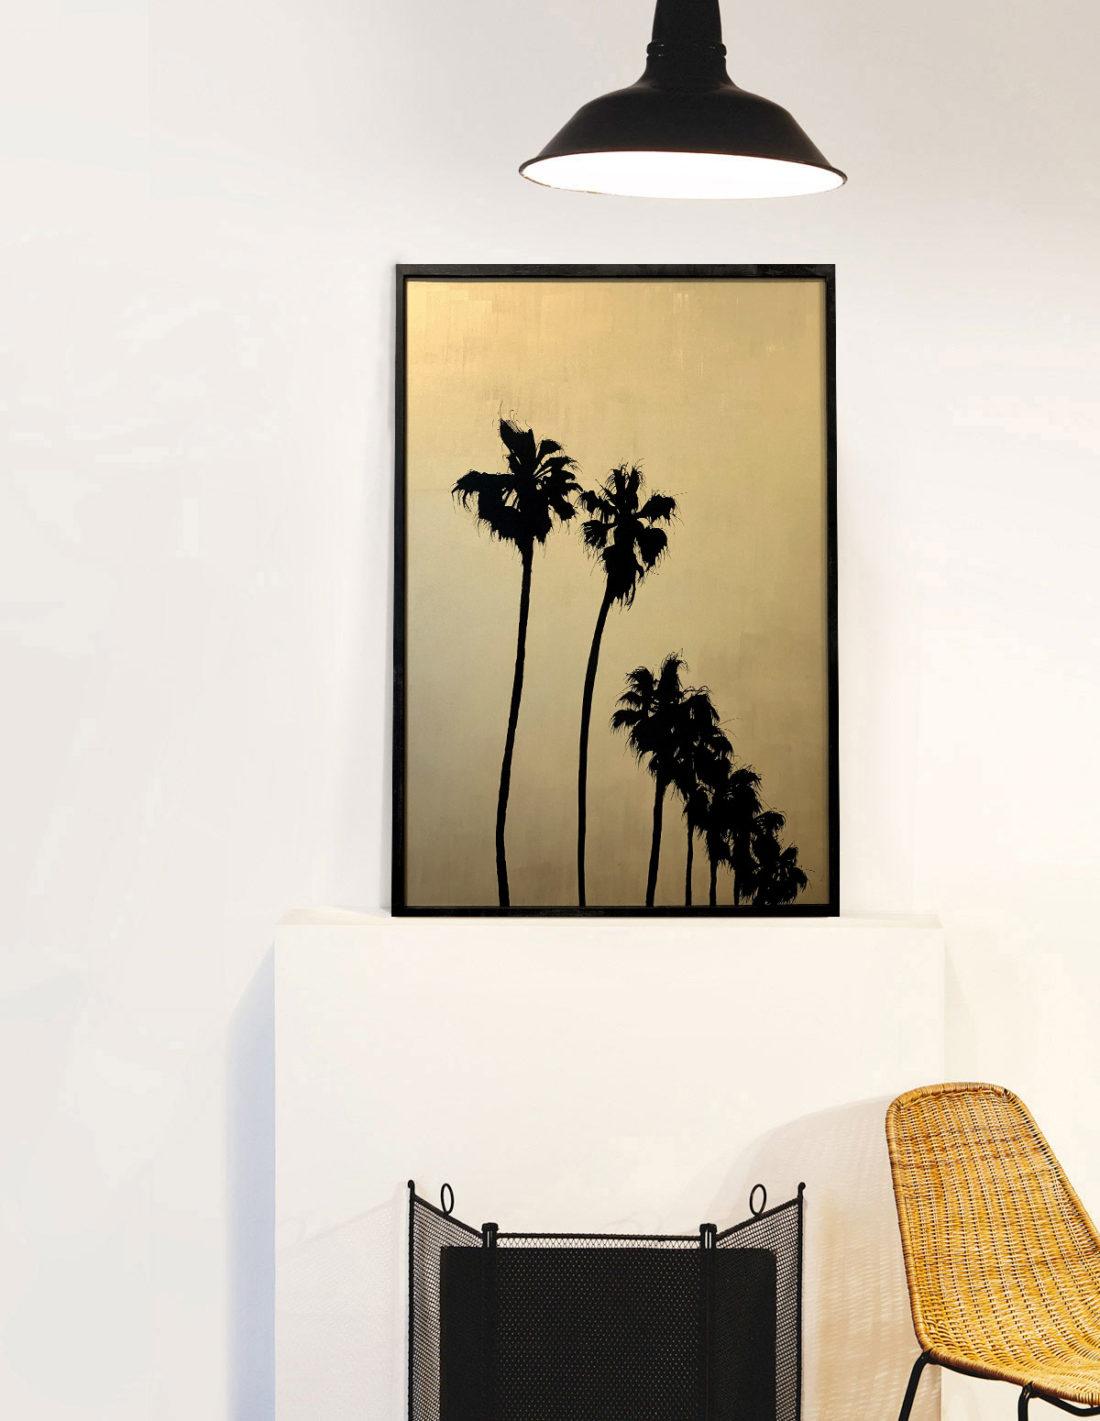 Grands palmtrees IV - Tableau- Hubert Jouzeau